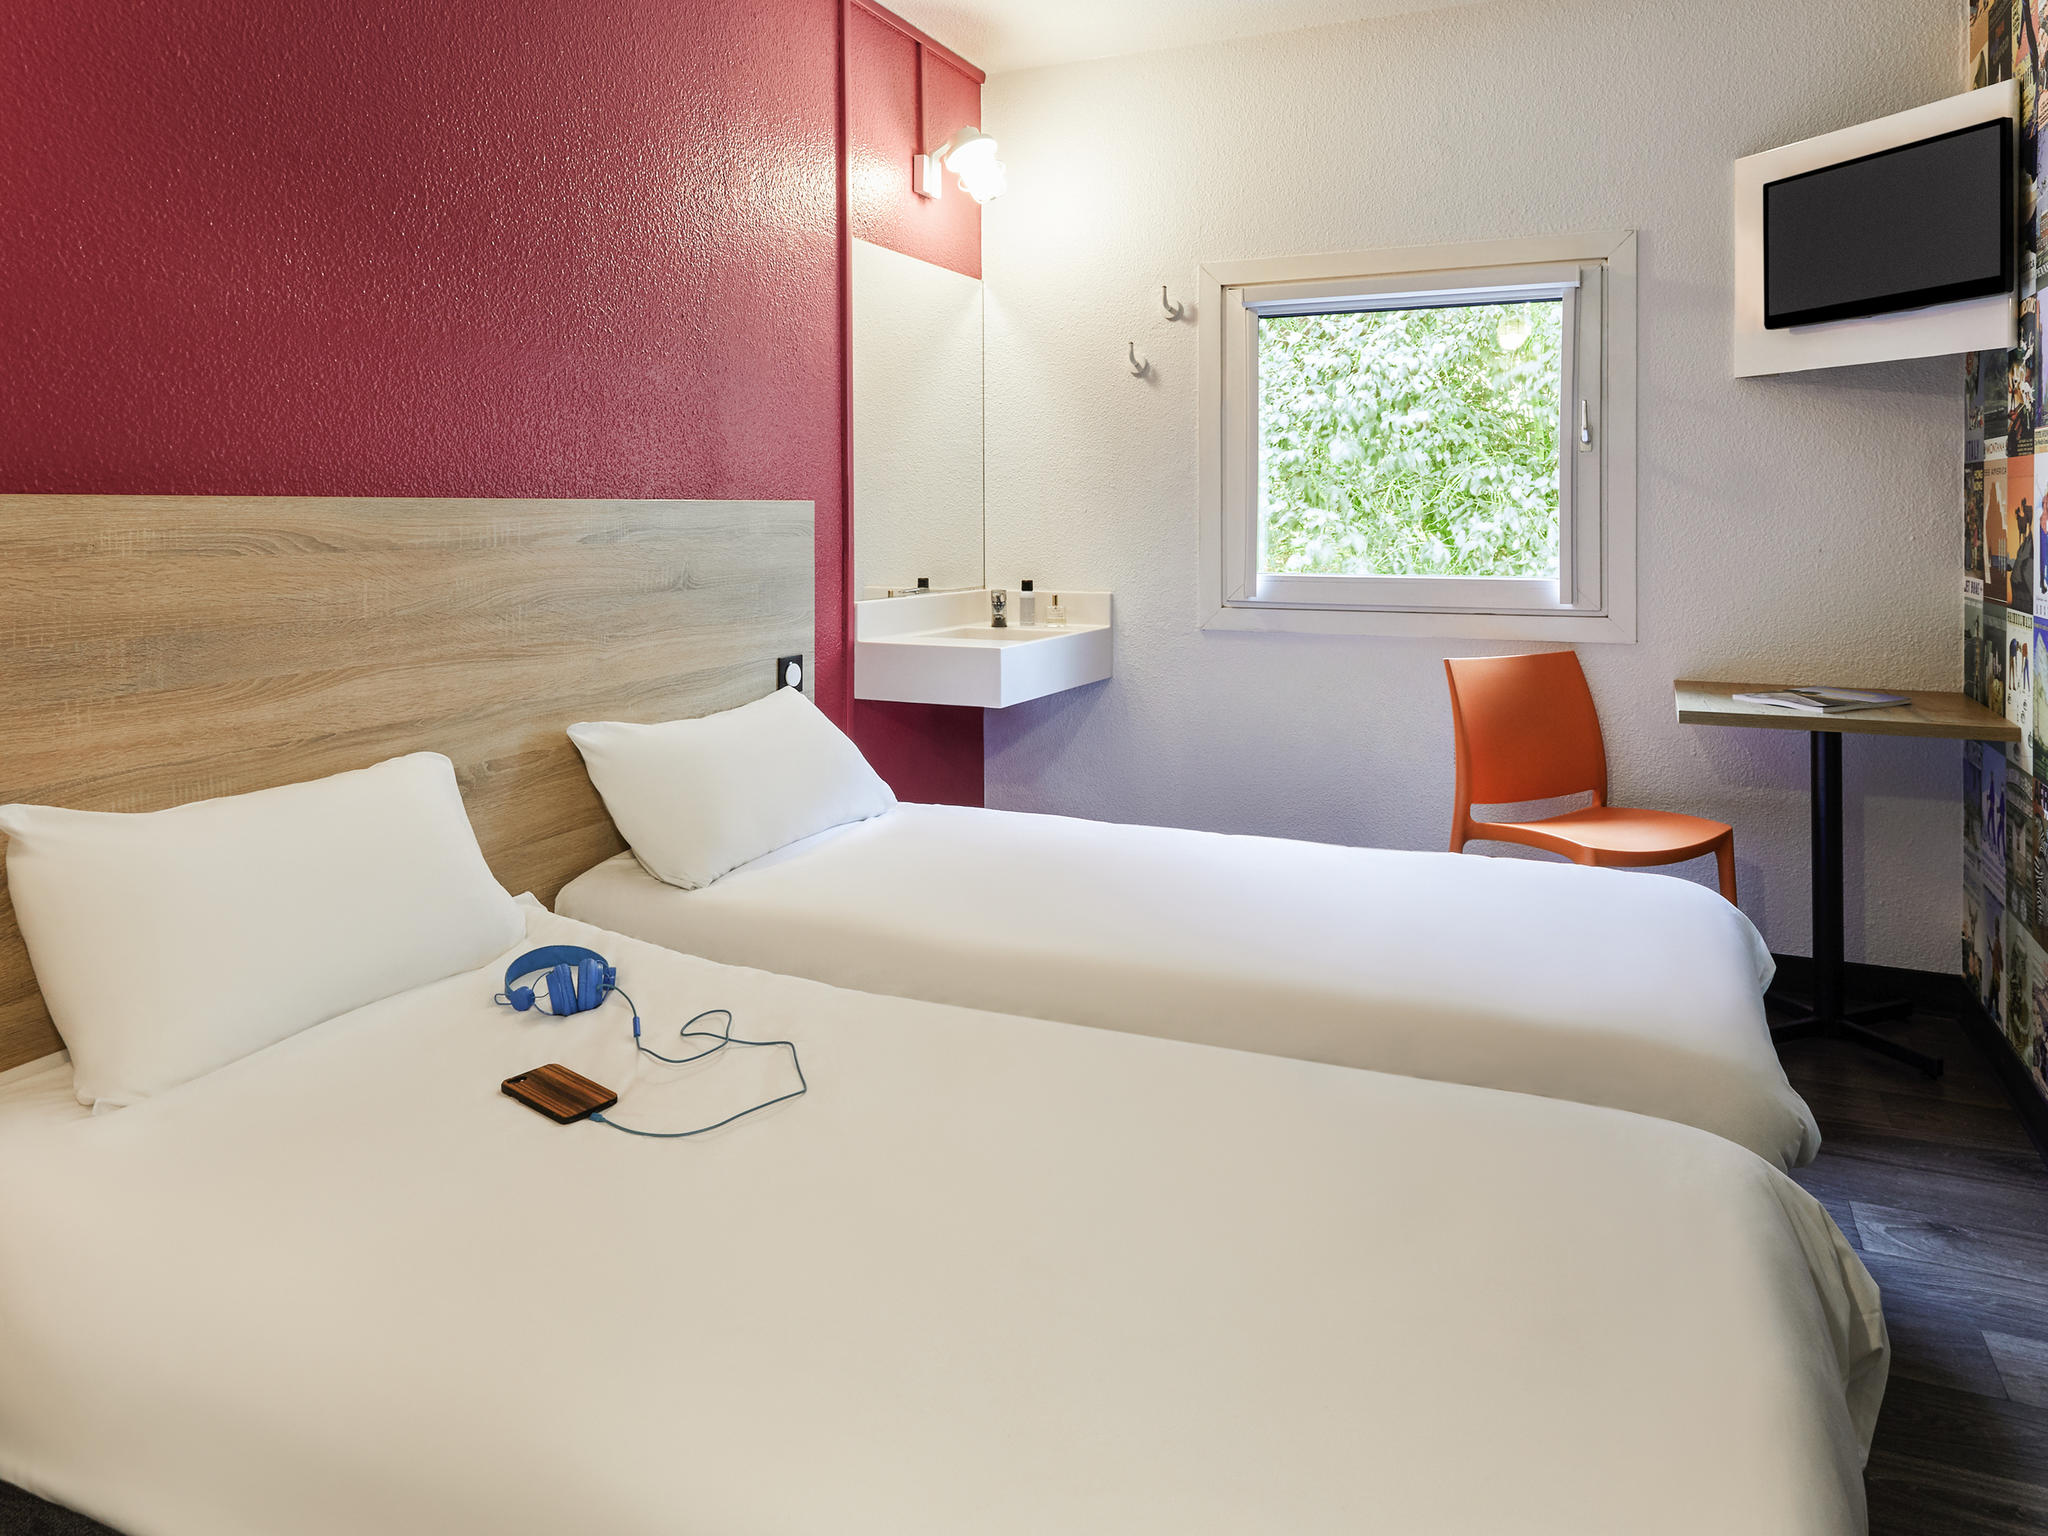 Hotel – hotelF1 Saint-Étienne (rénové)